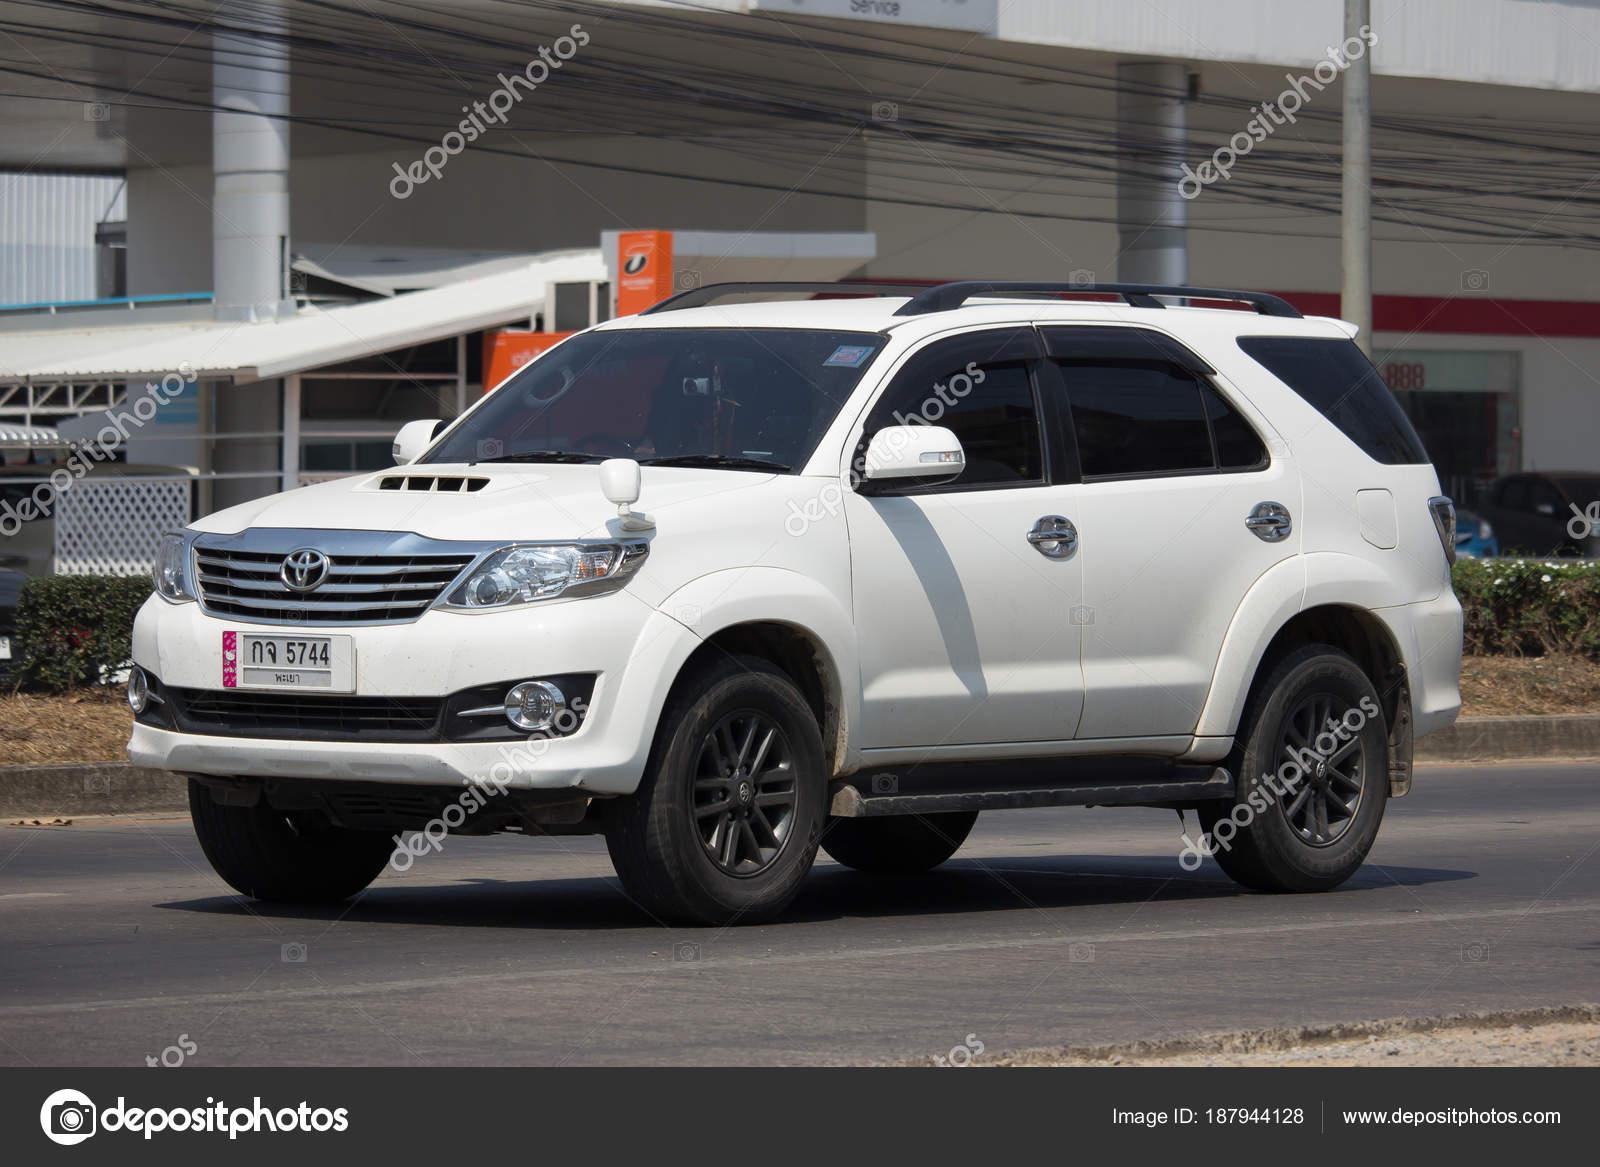 Private Toyota Fortuner Suv Car Stock Editorial Photo